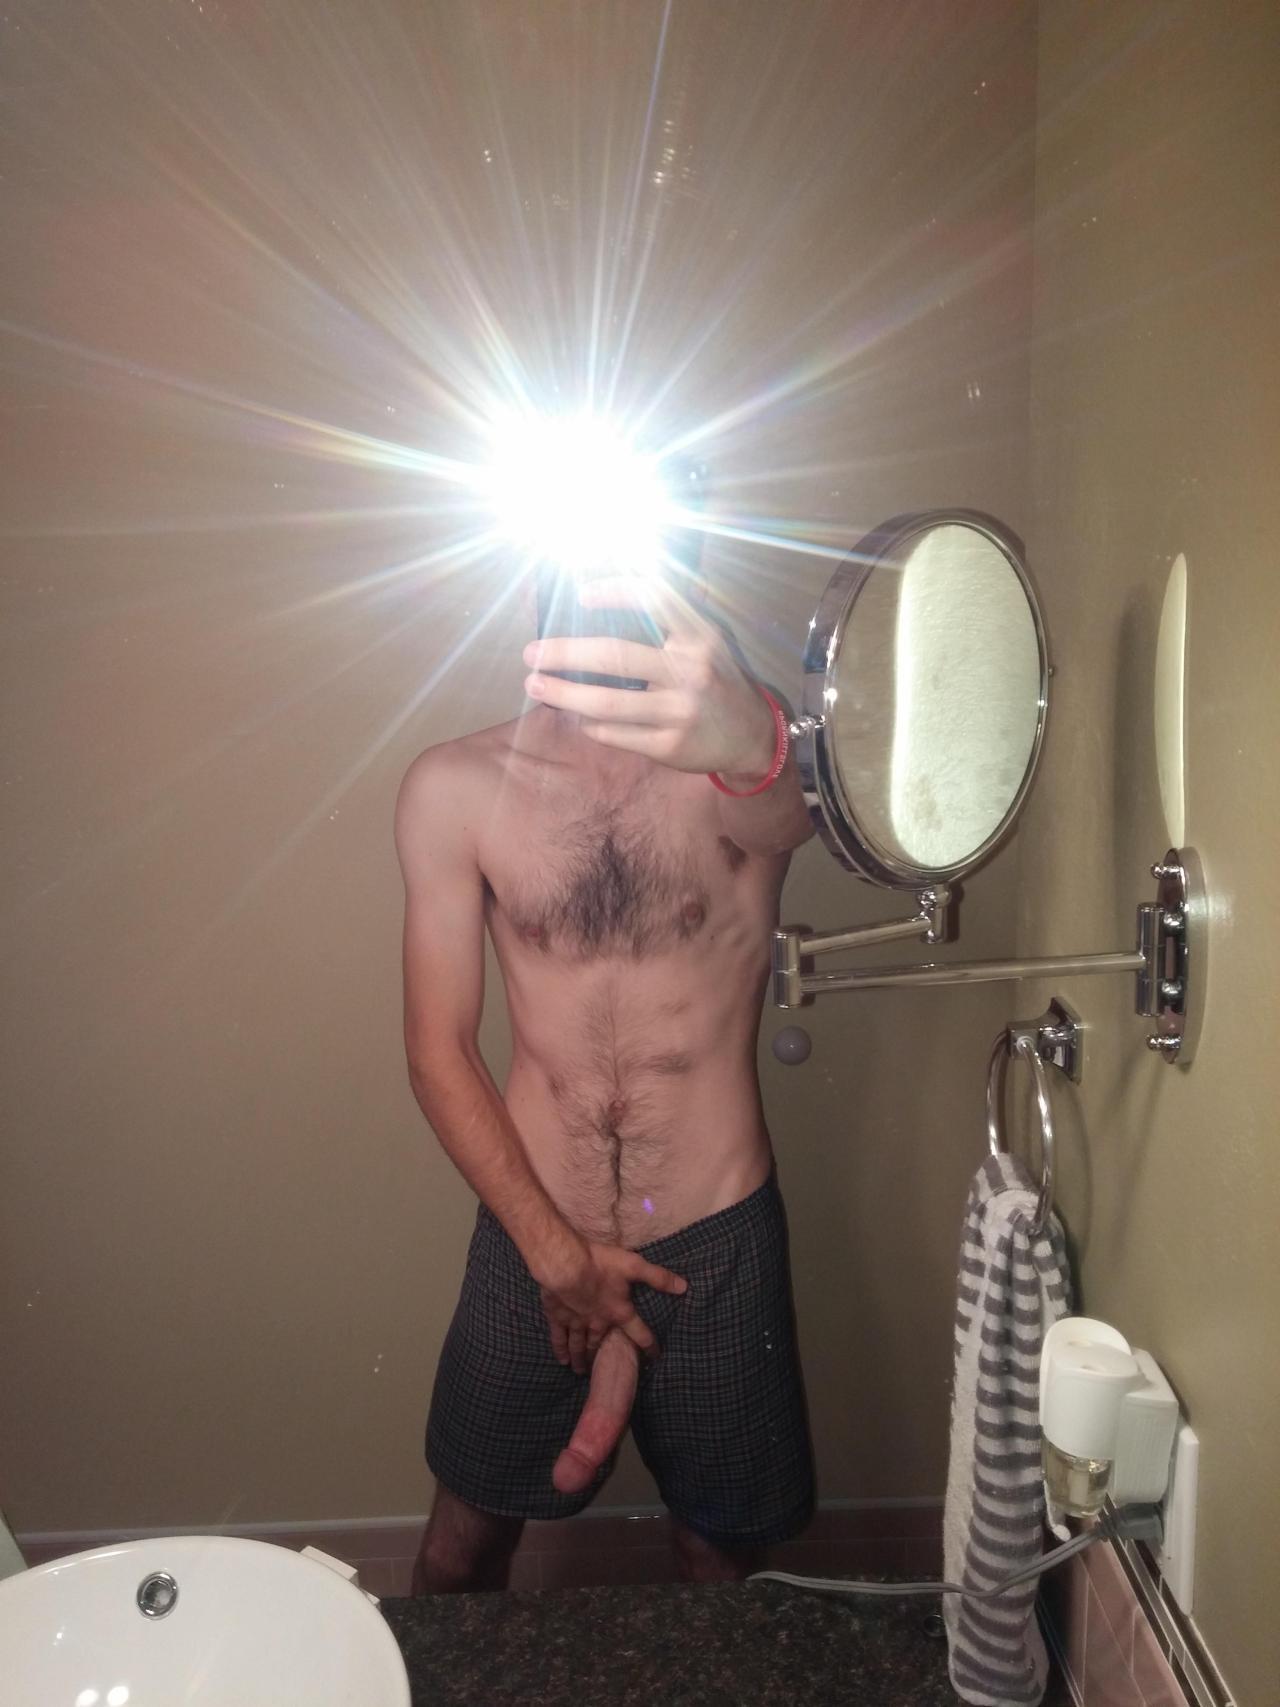 tumblr cock dildo